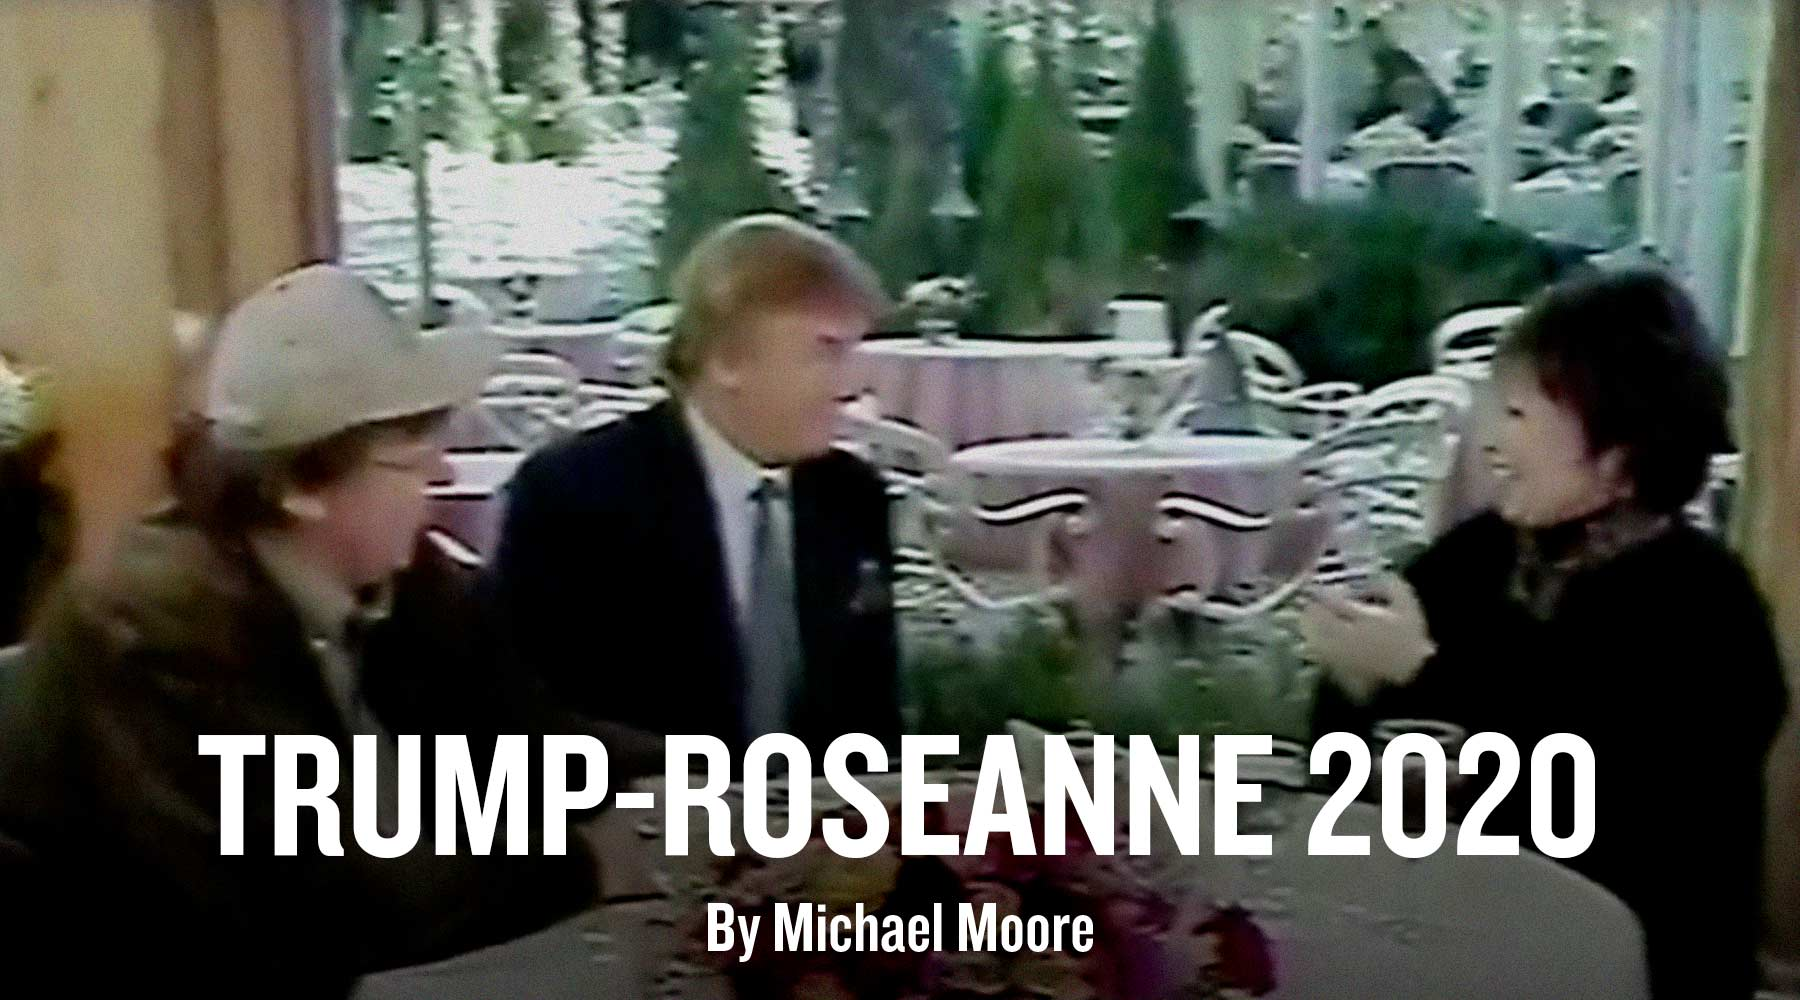 Roseanne Barr Show 2020.Trump Roseanne 2020 Michael Moore